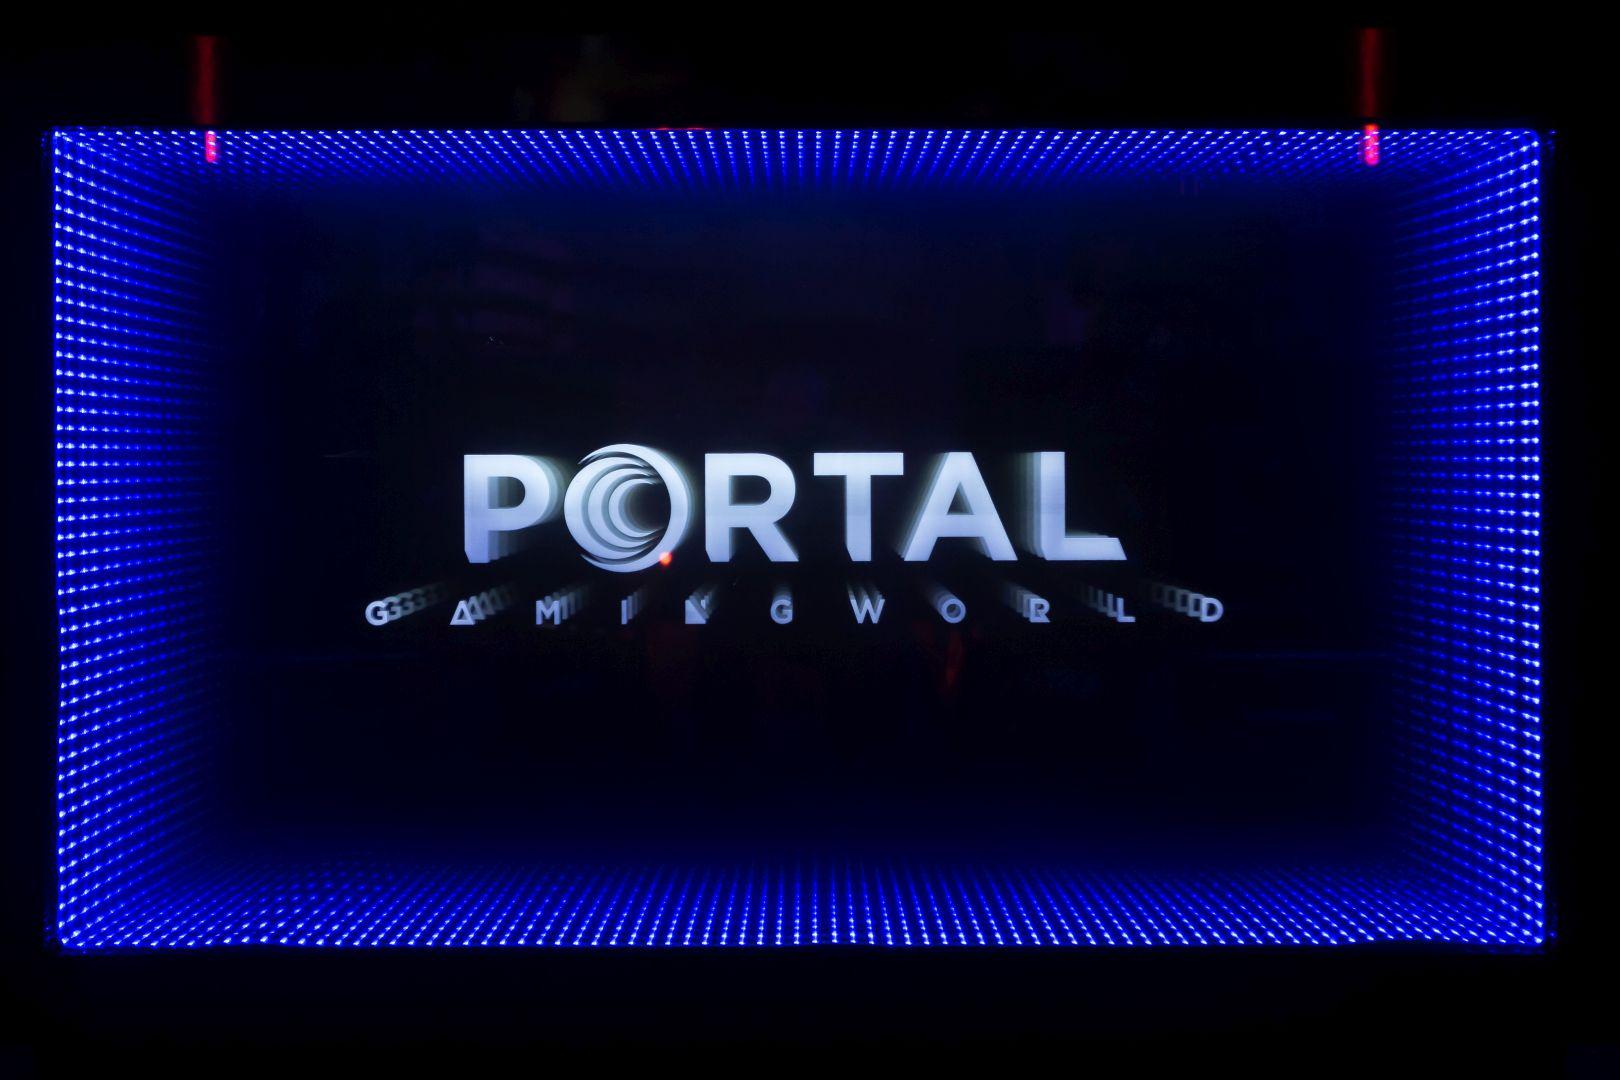 Portal-infinity mirror